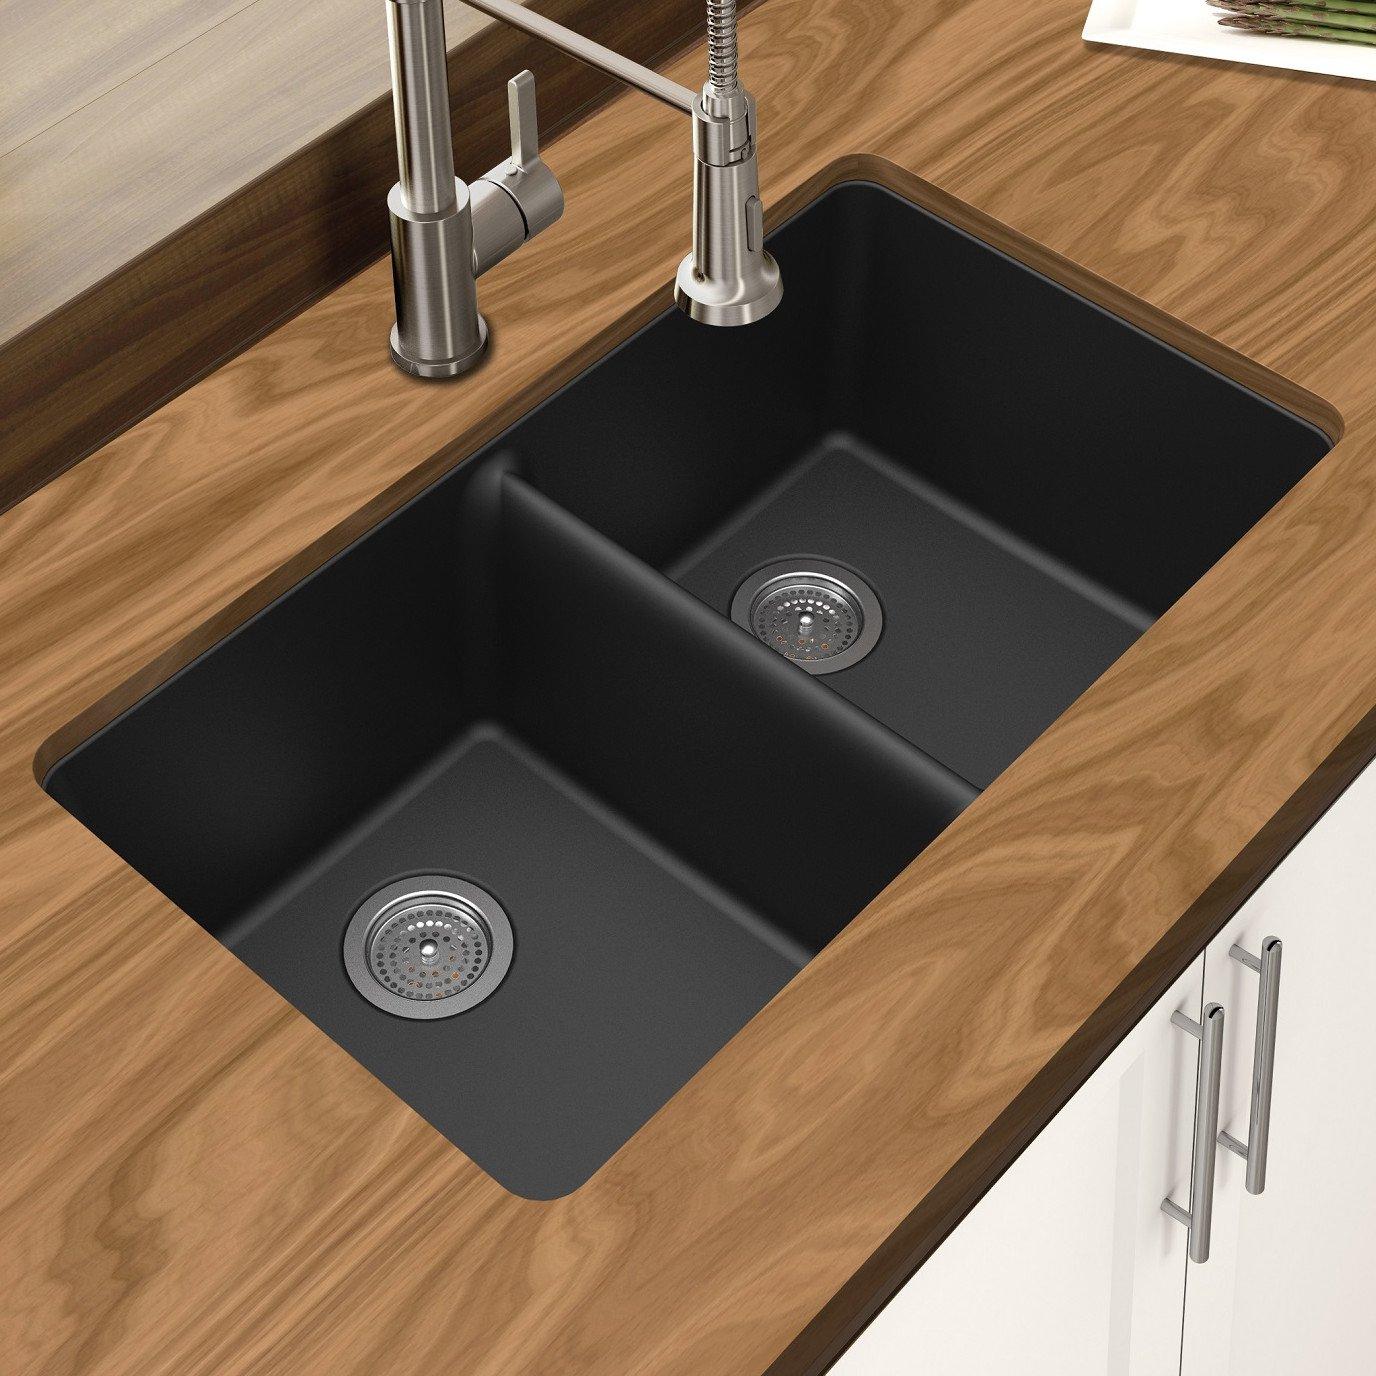 Winpro New Black Granite Quartz 33'' x 18-3/4'' x 9-1/2'' Equal Double Bowl Undermount Sink